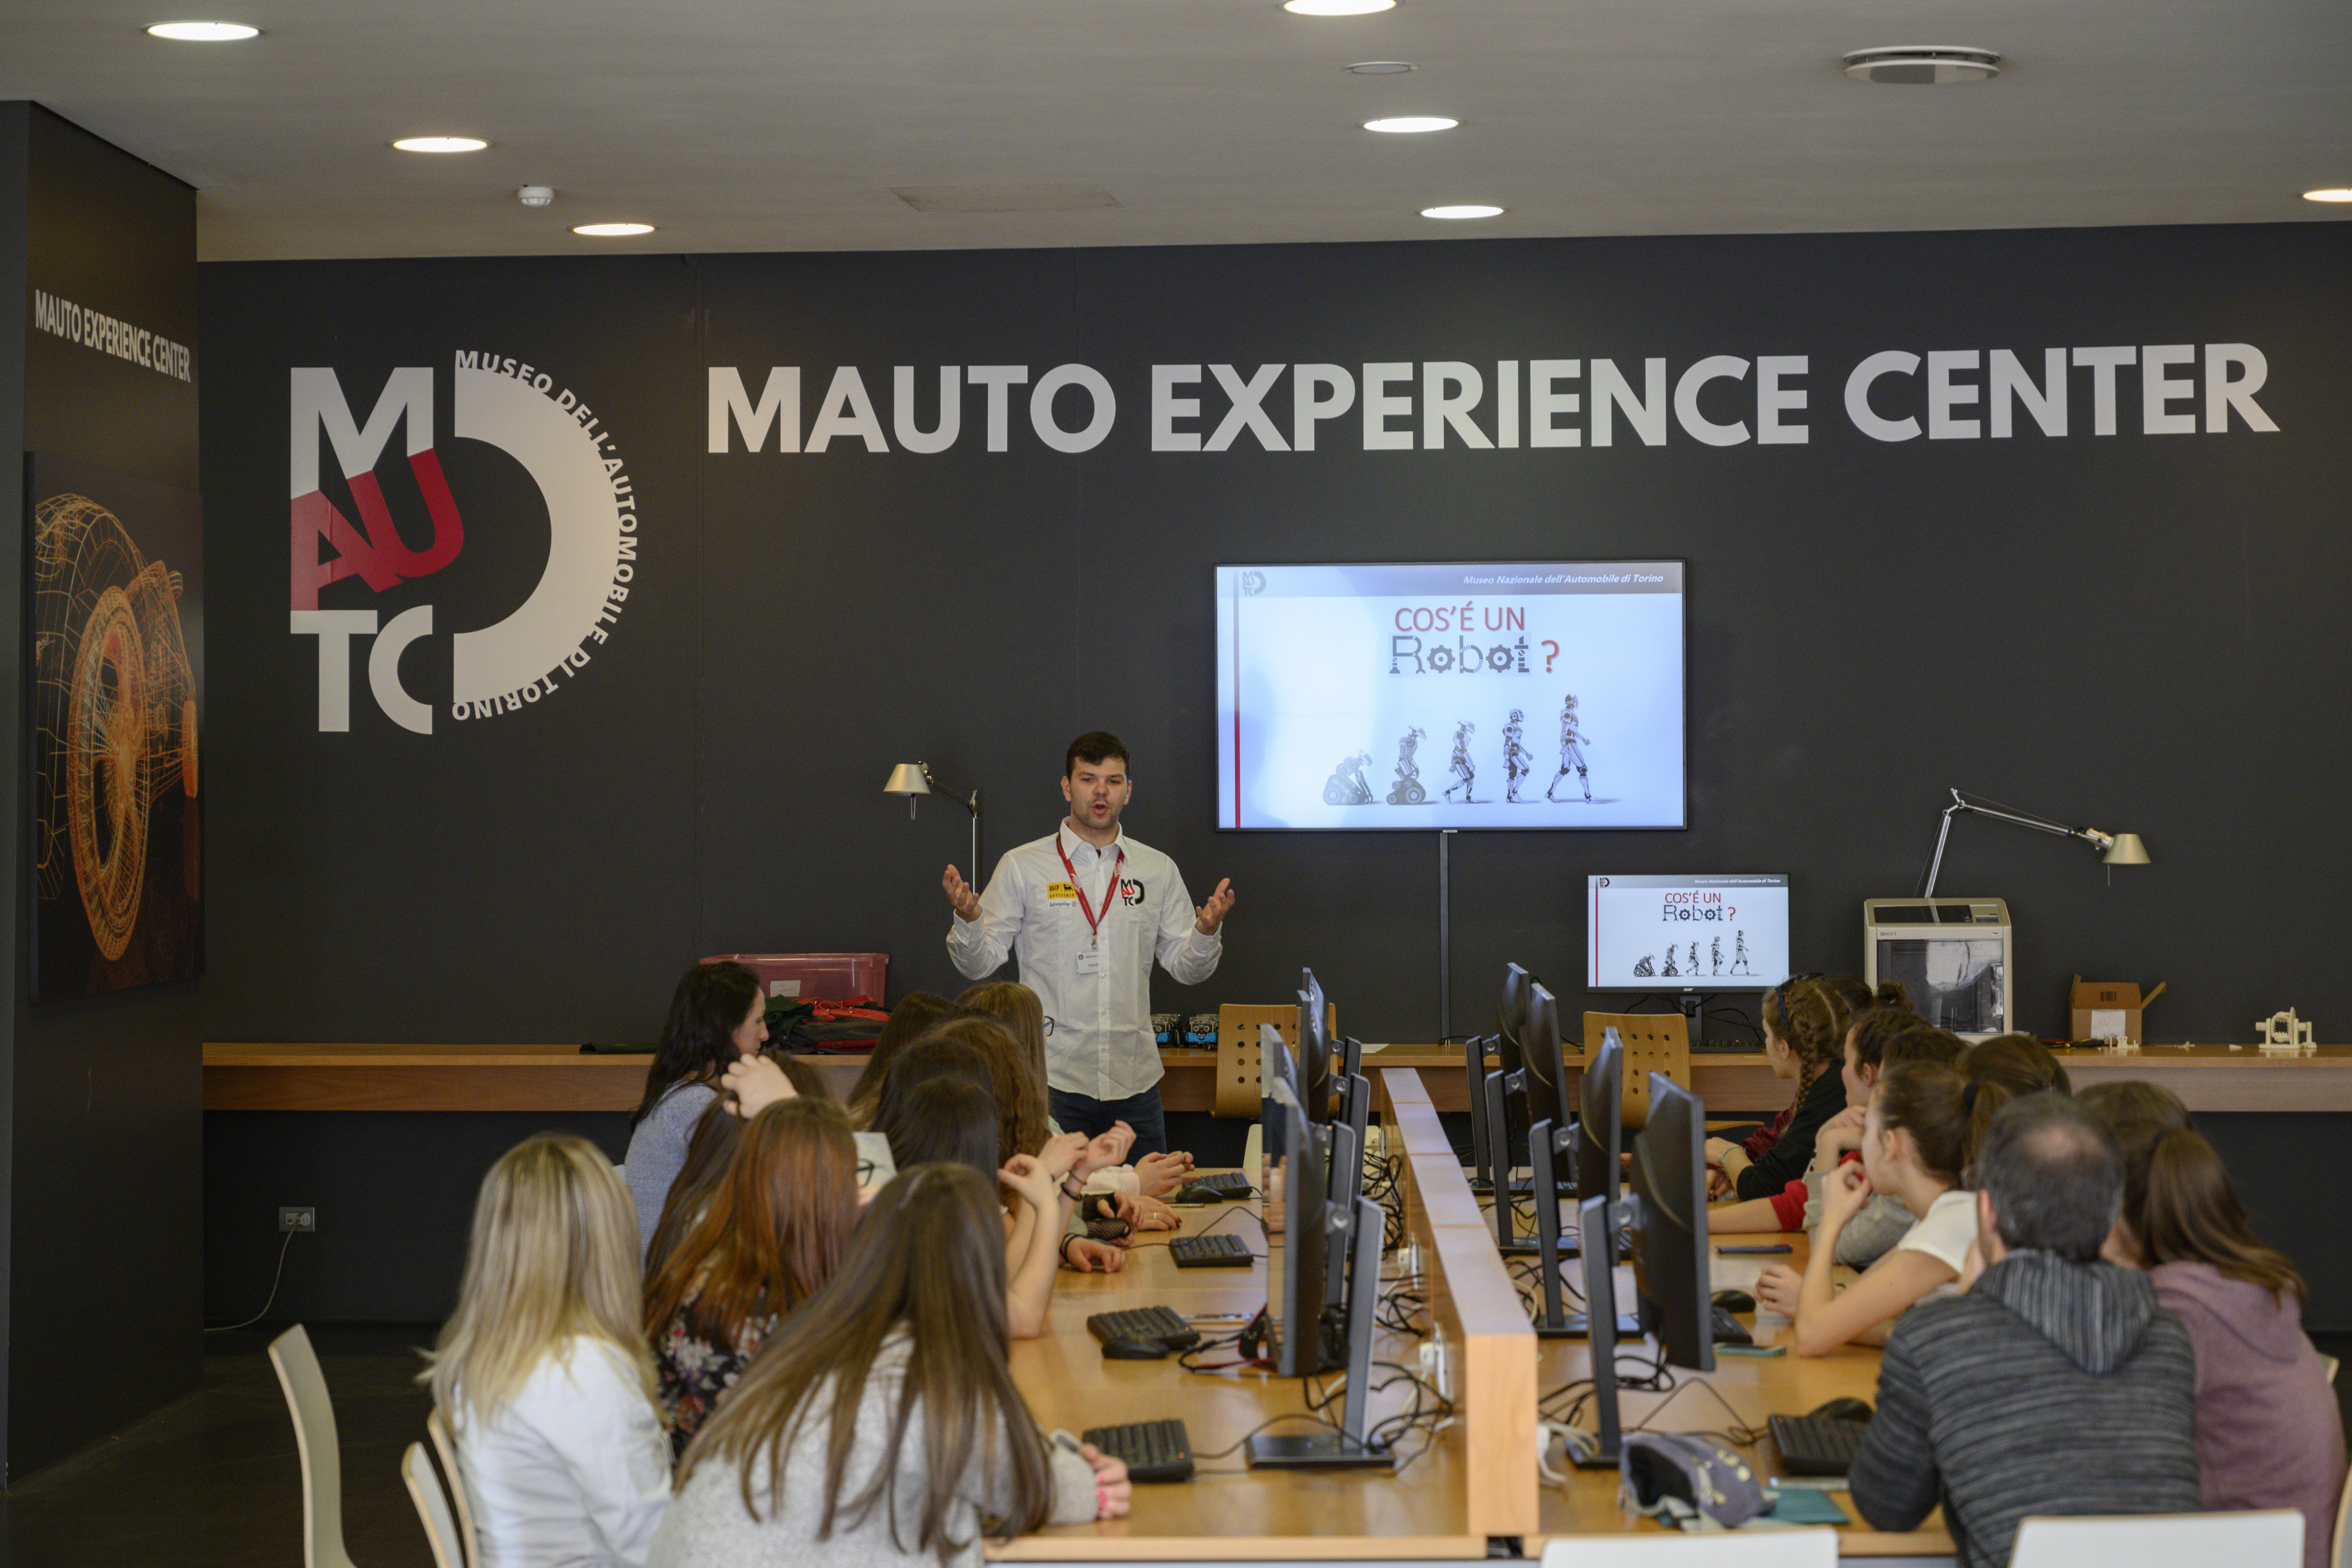 MAUTO_laboratori 0004